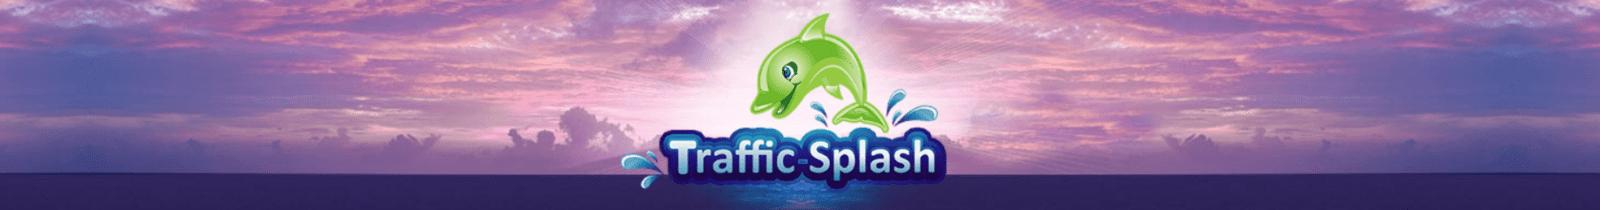 Get Free Traffic with Traffic-Splash